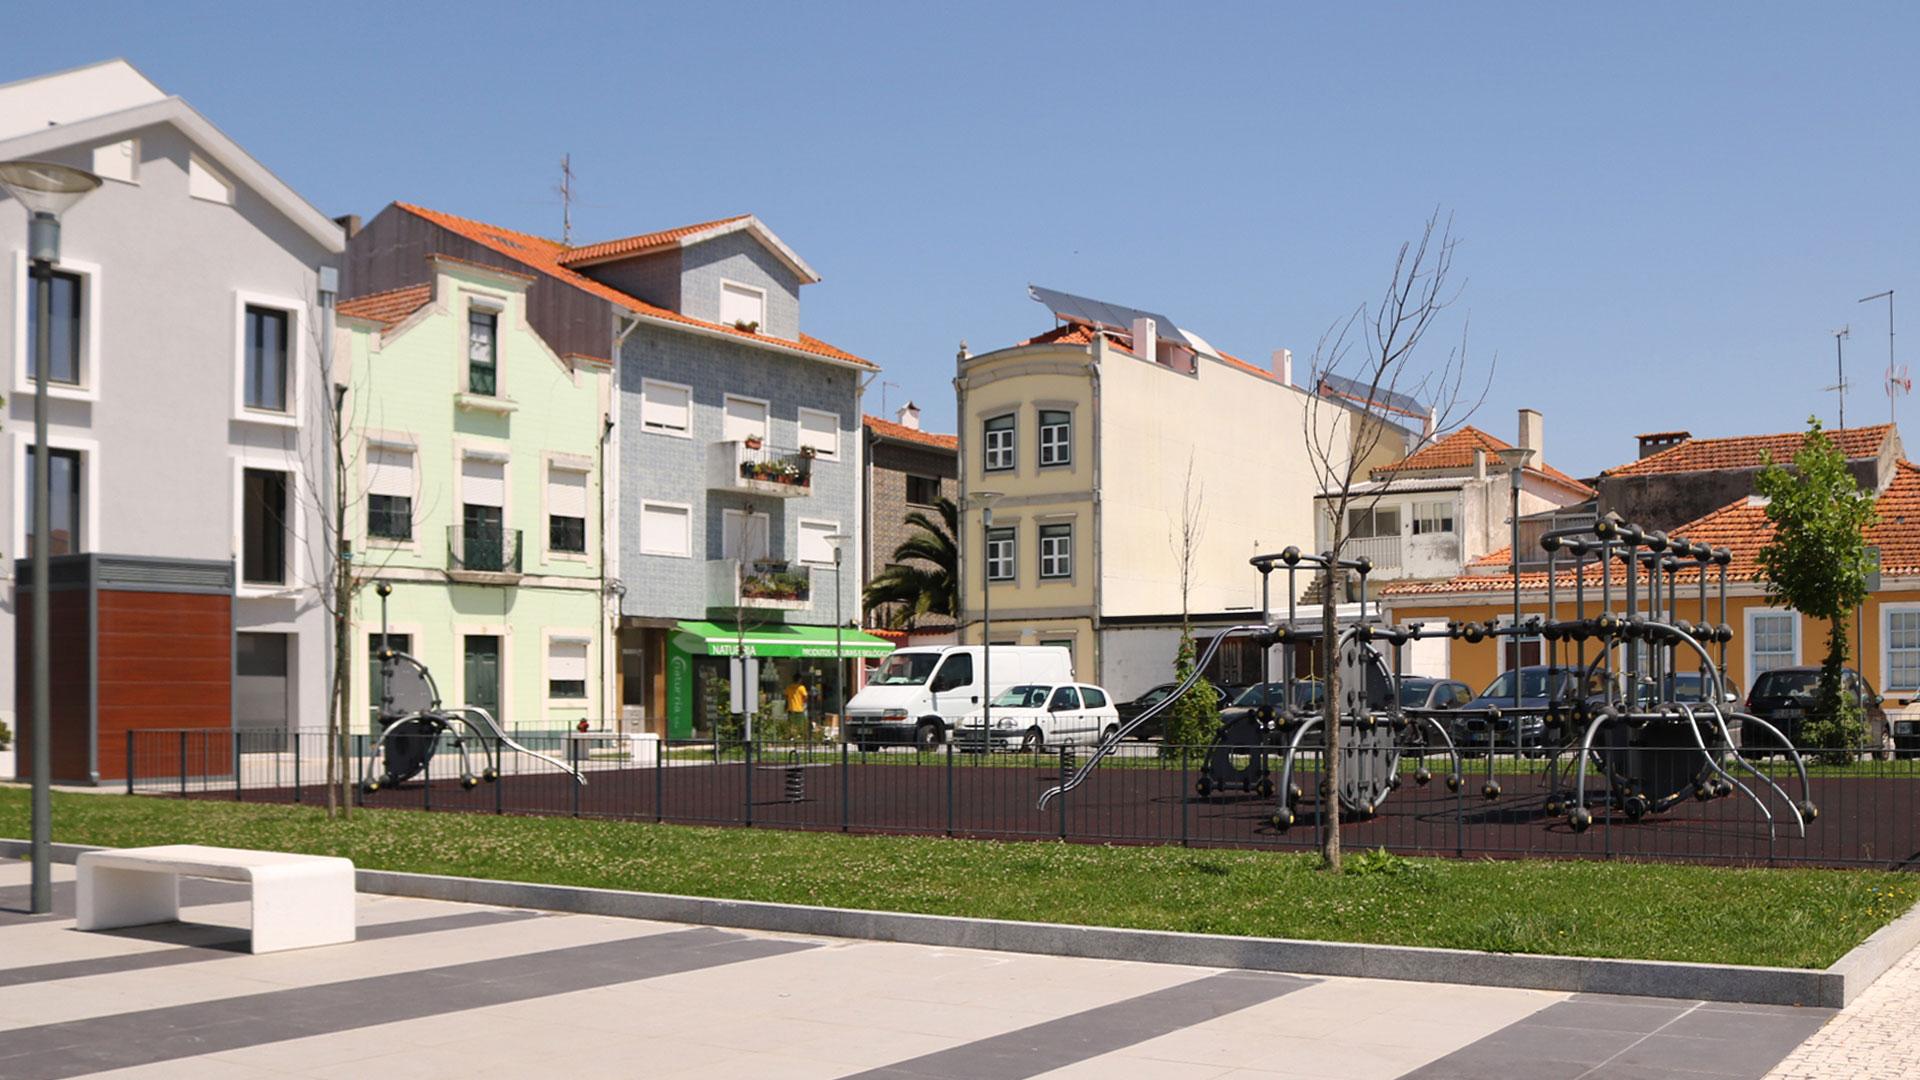 Alboi-Aveiro-ville-real-estate-imobiliaria-comprar-arrendar-vender-moradia-apartamento-casa-t0-t1-t2-t3-t4-4